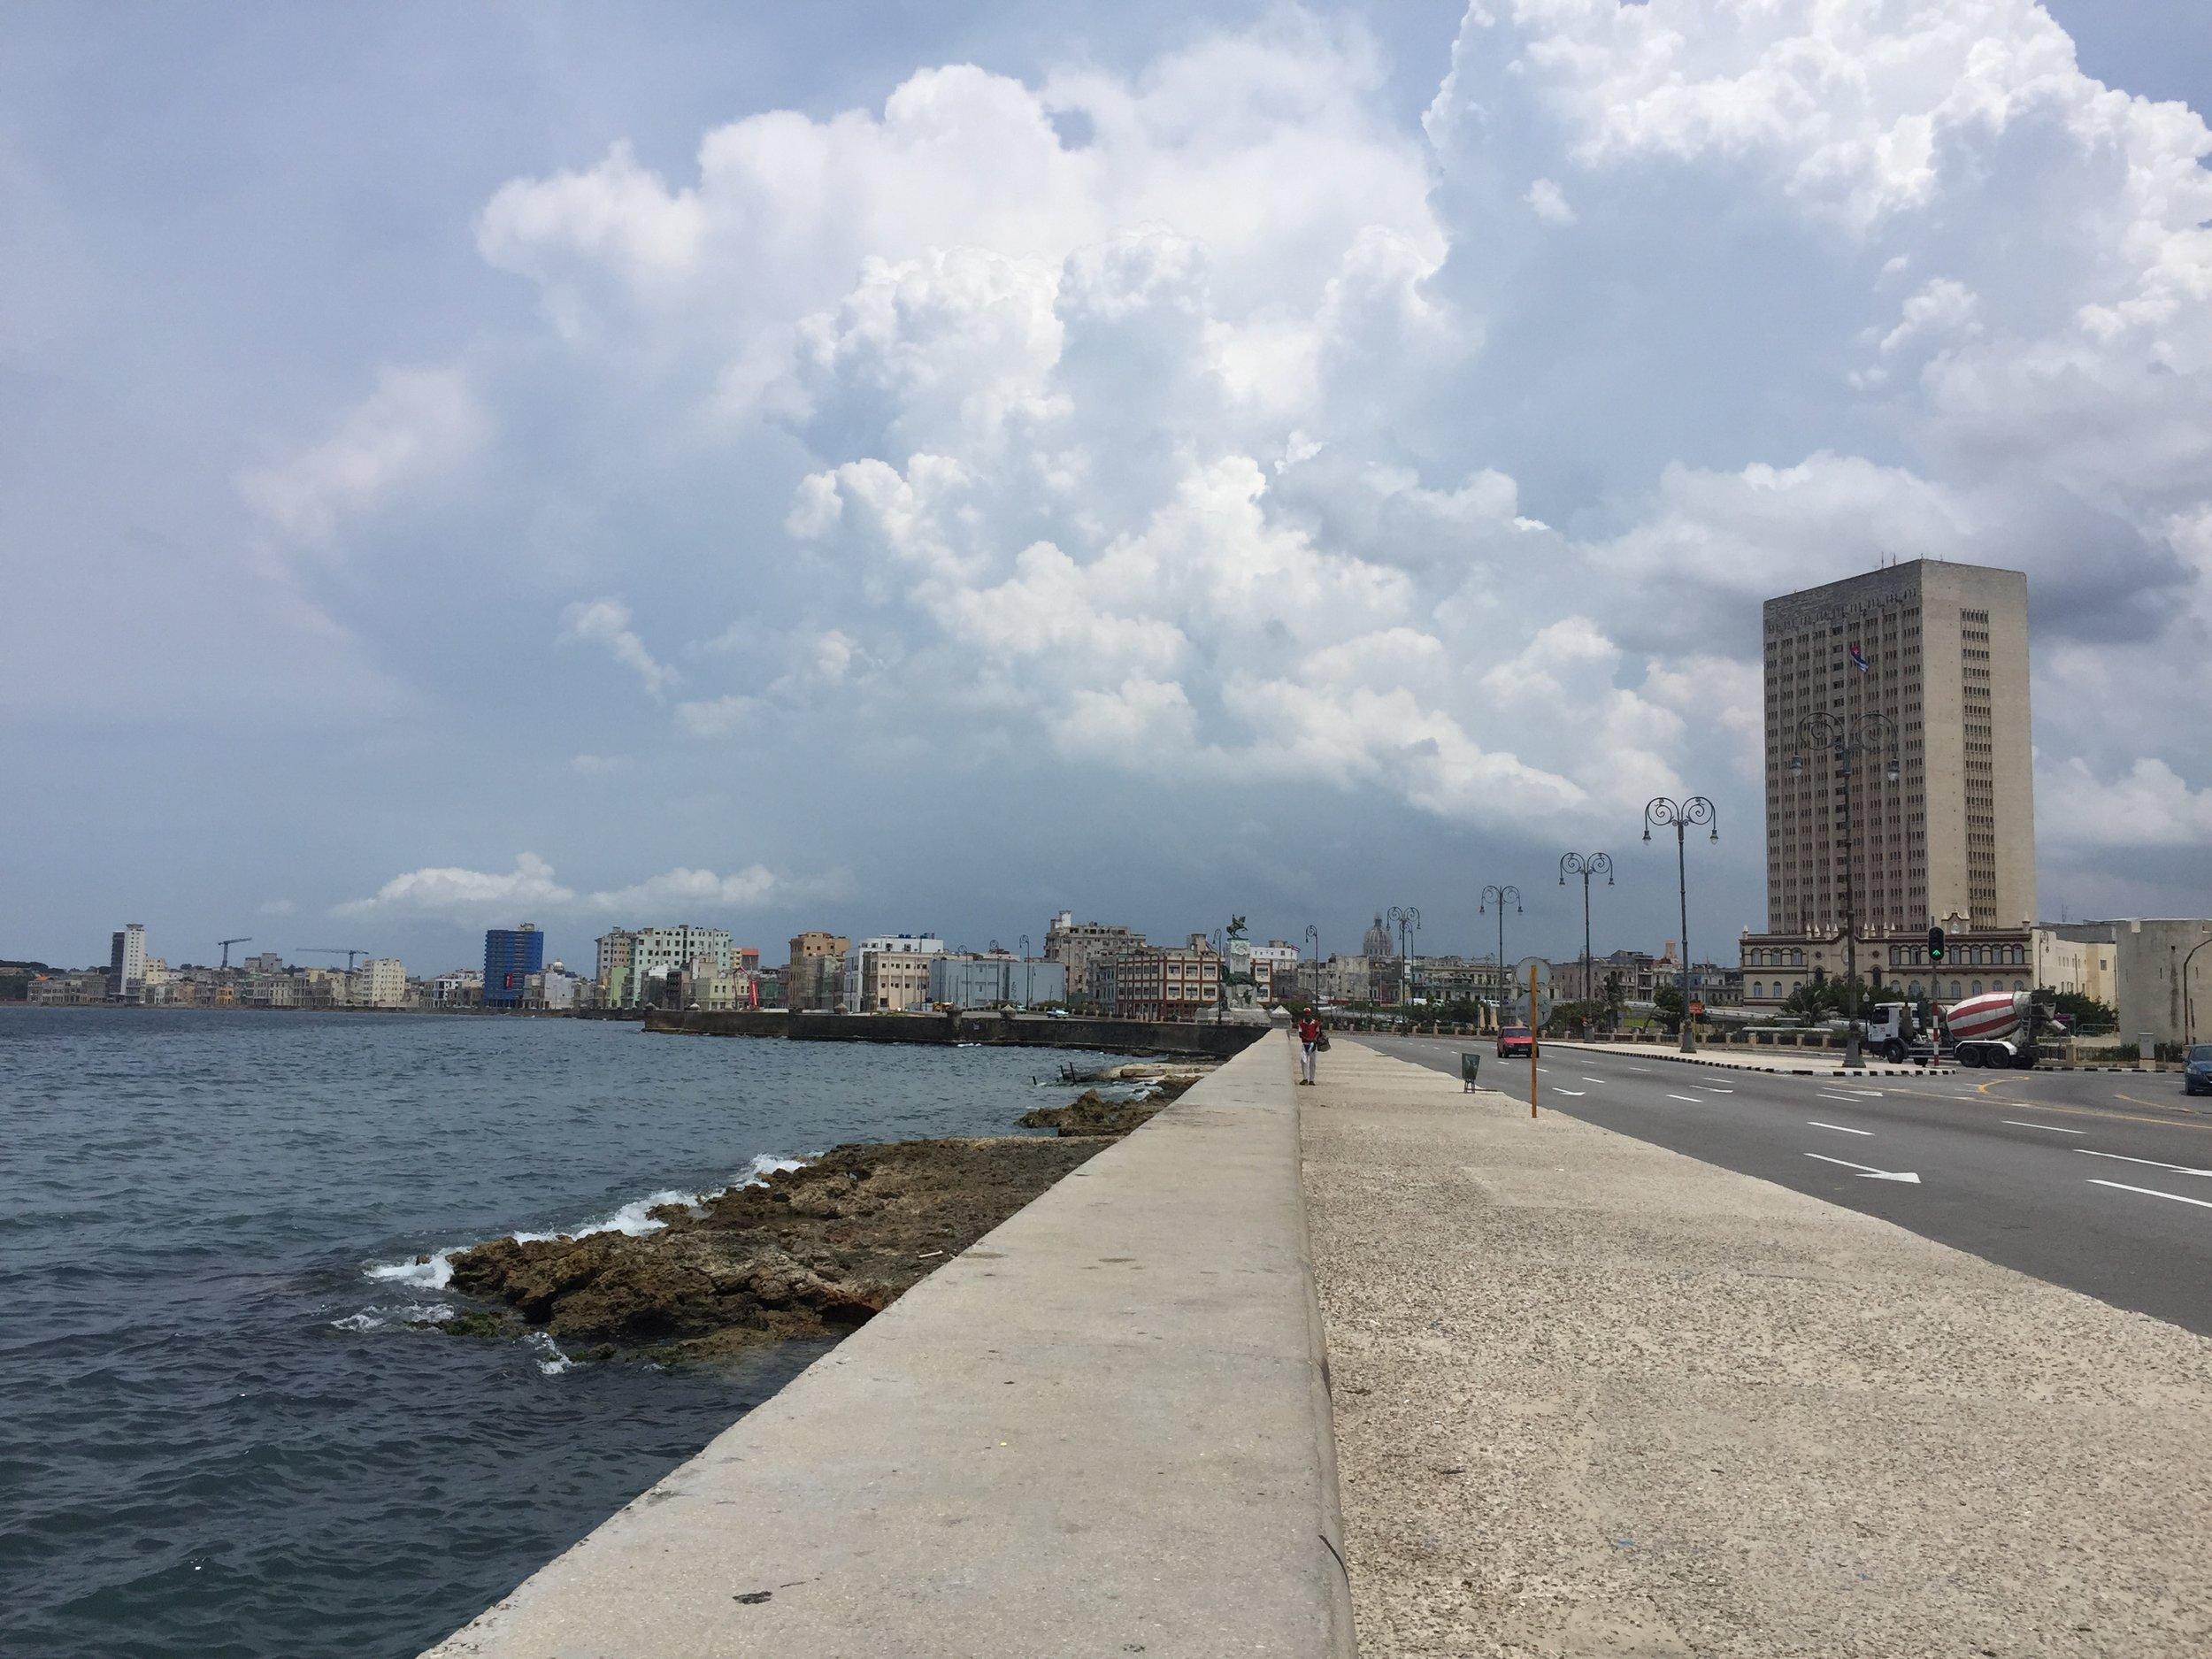 Looking toward Centro and Habana Vieja from the Malecón